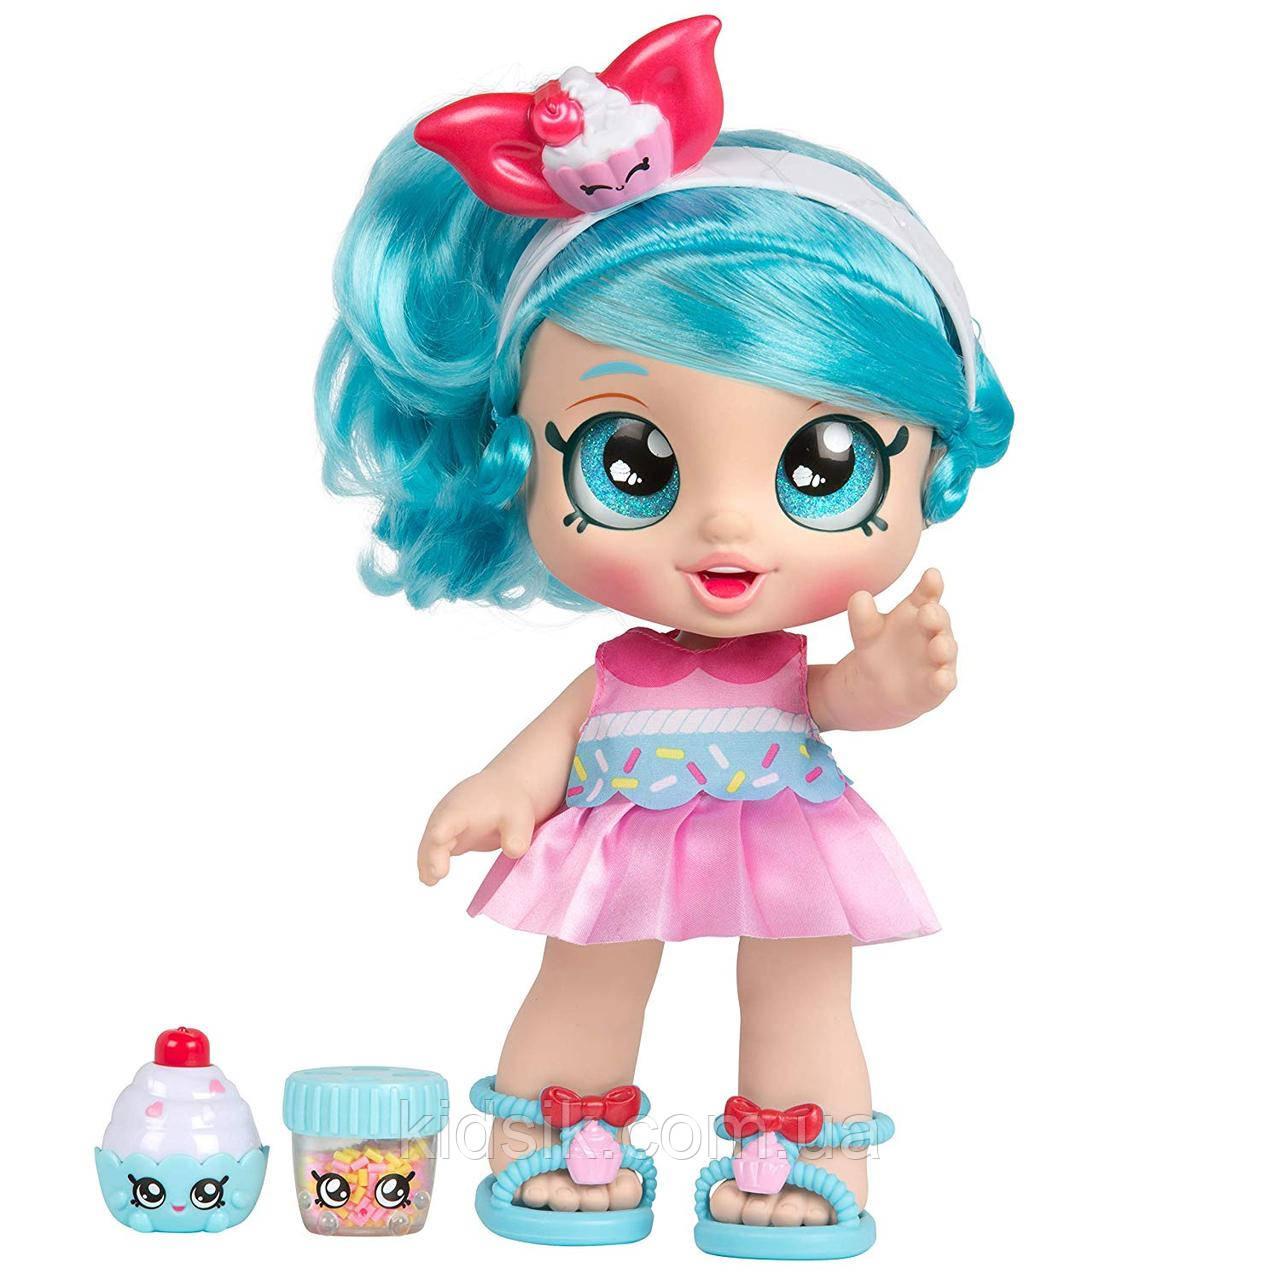 Кукла Кинди КидсДжессикейк / Kindi KidsJessicake, фото 1